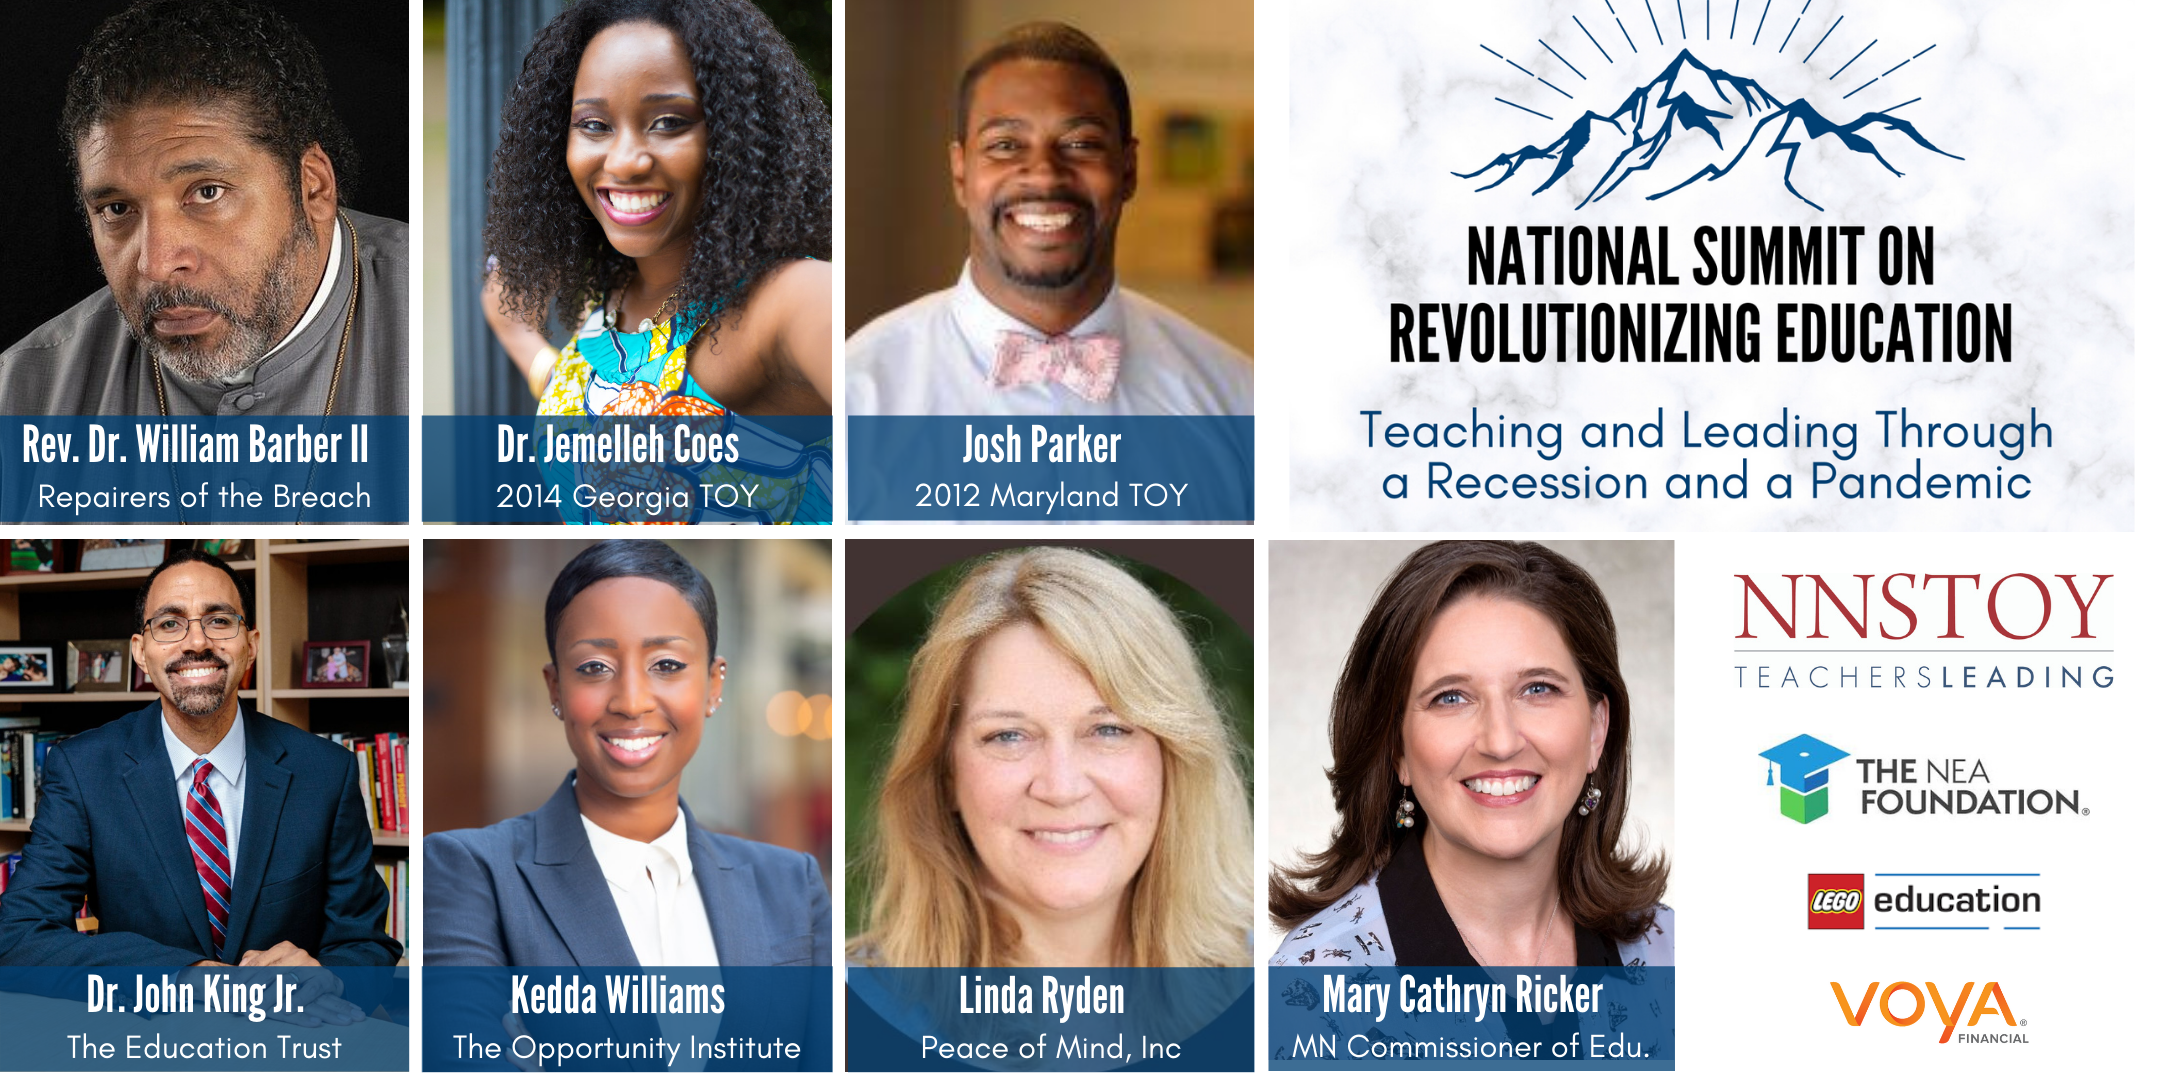 Watch: National Summit on Revolutionizing Education